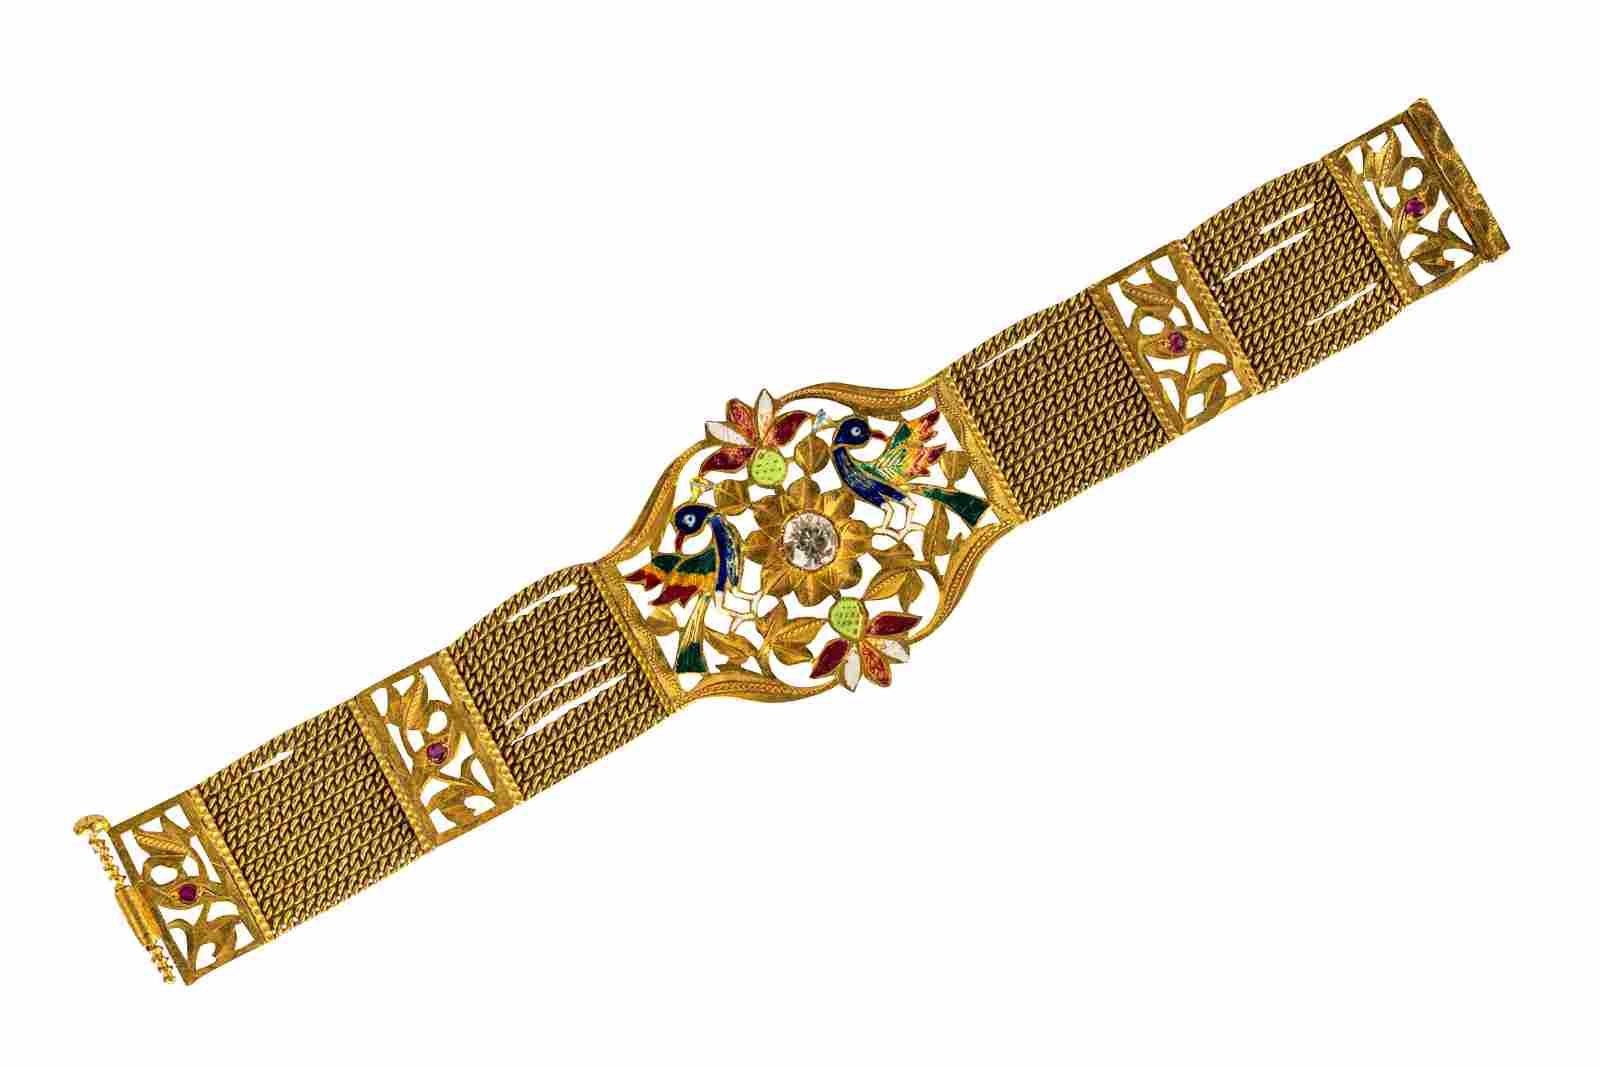 18 KARAT GOLD, ENAMEL, & DIAMOND SIMULANT BRACELET